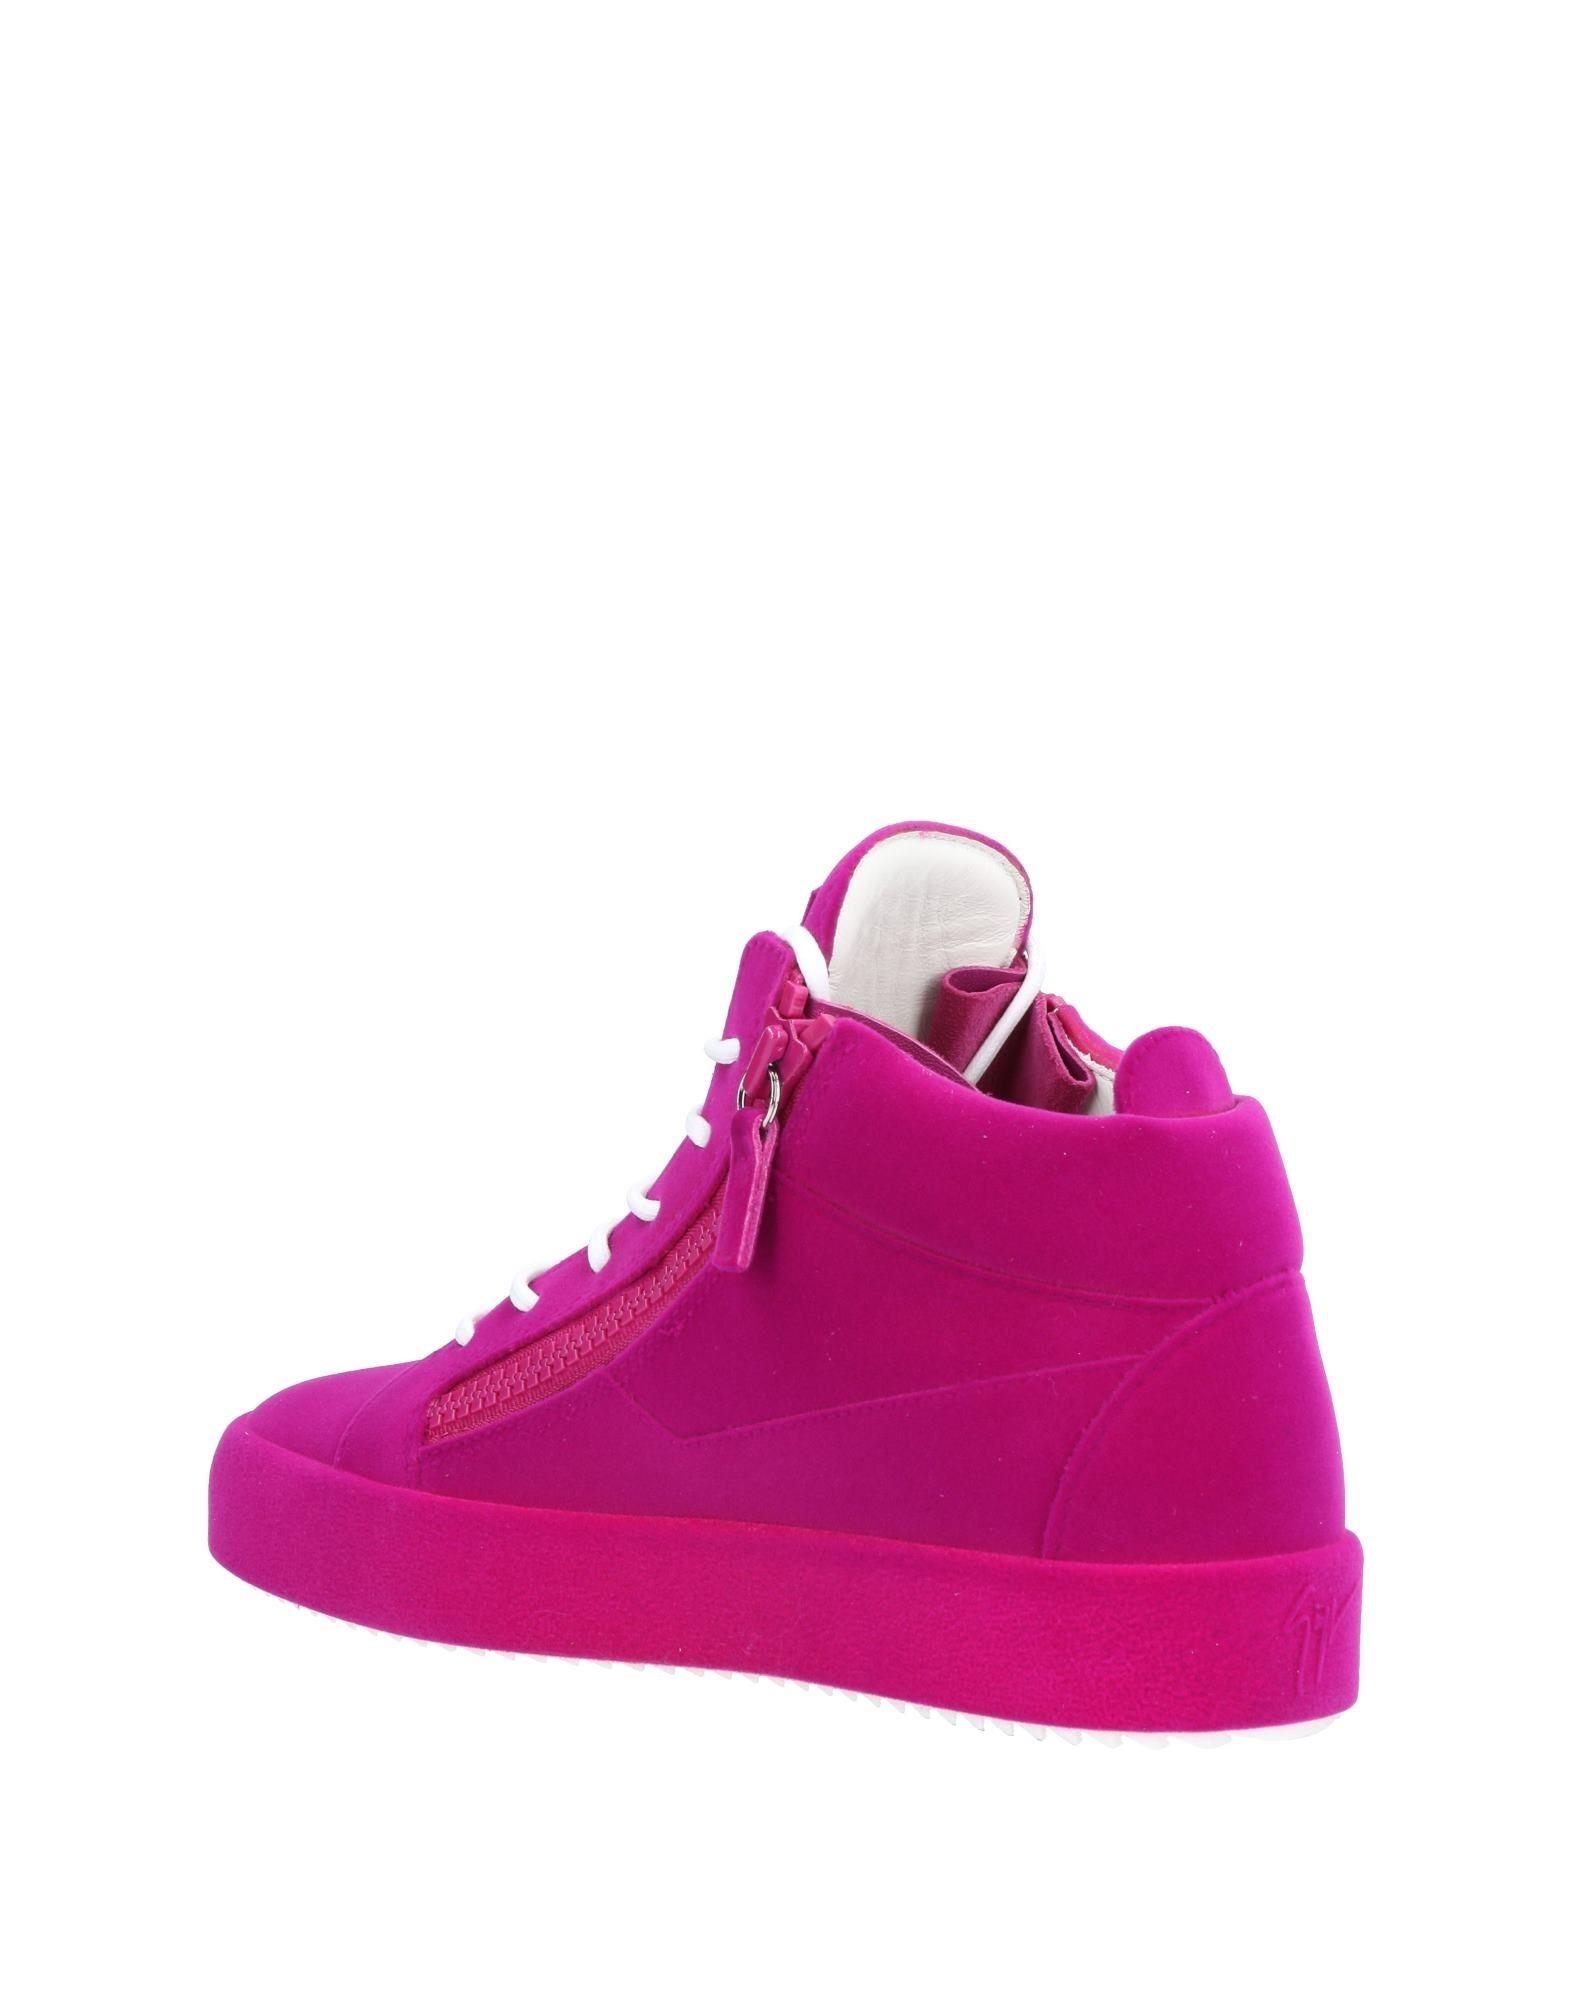 Giuseppe Zanotti Sneakers Herren Herren Sneakers  11463775TJ 7a9590